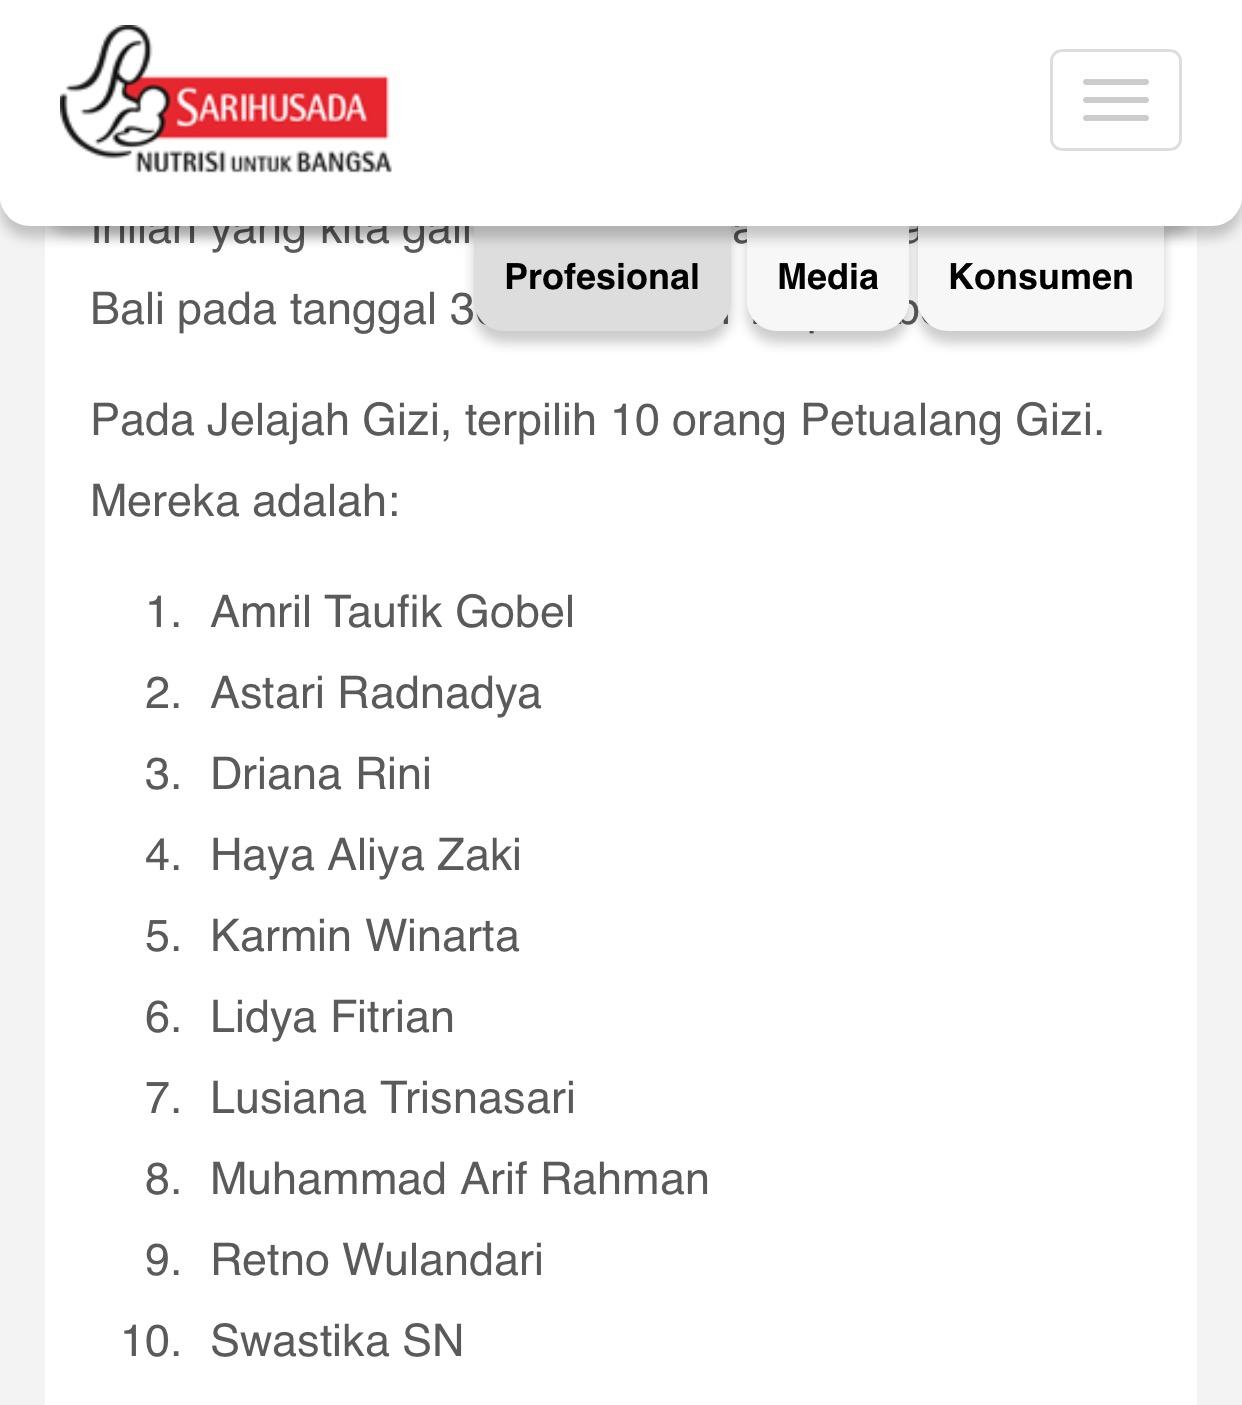 Pemenang lomba blog Jelajah Gizi Bali